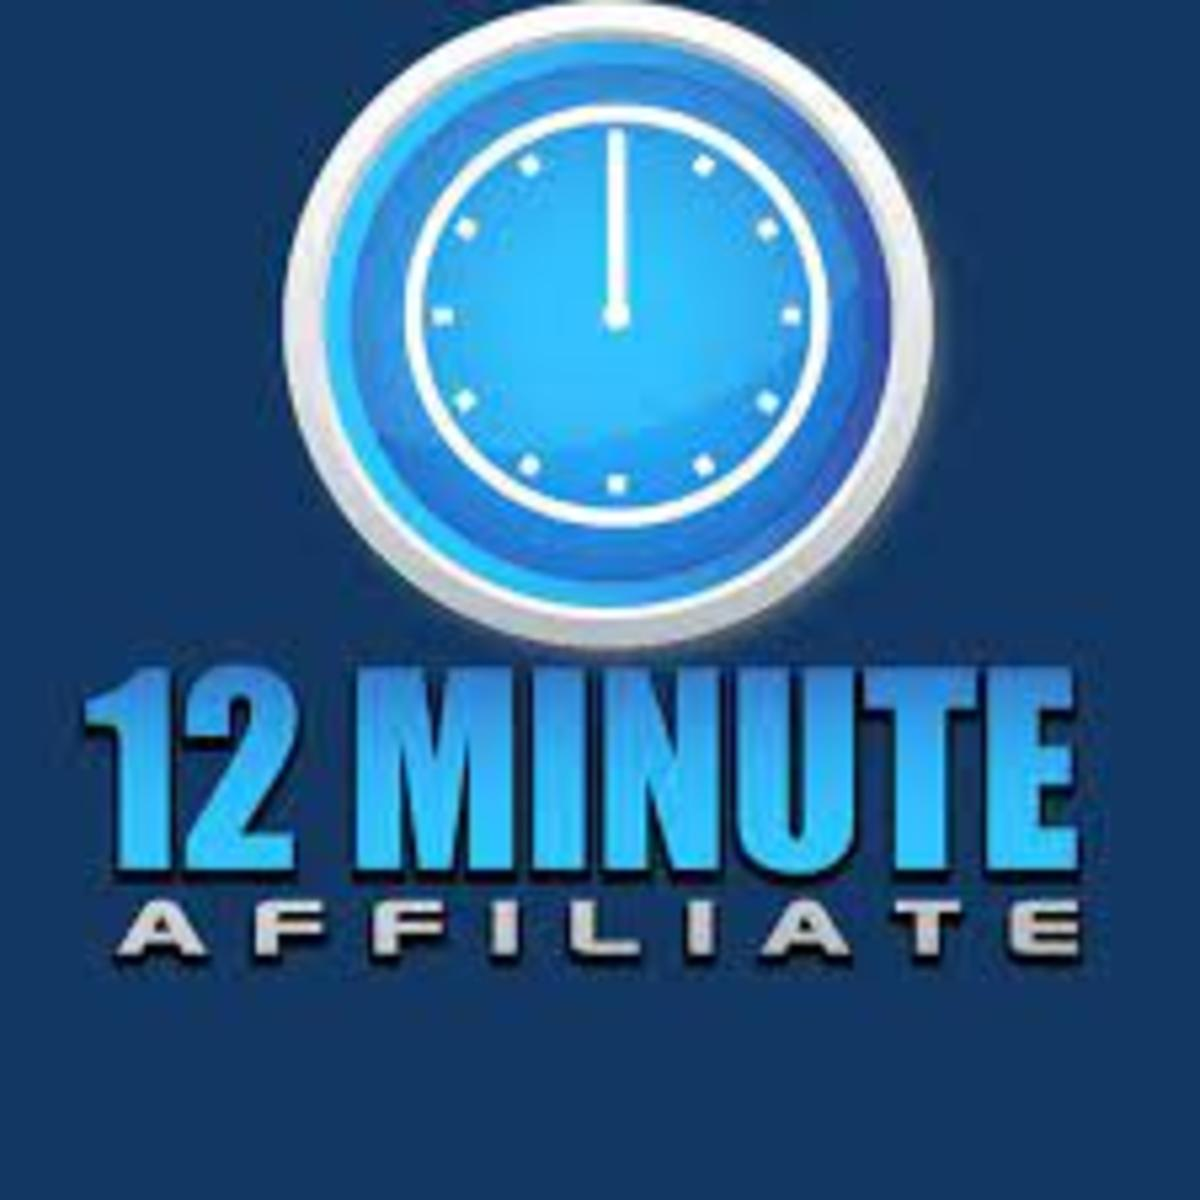 passive-thru-affiliate-marketing